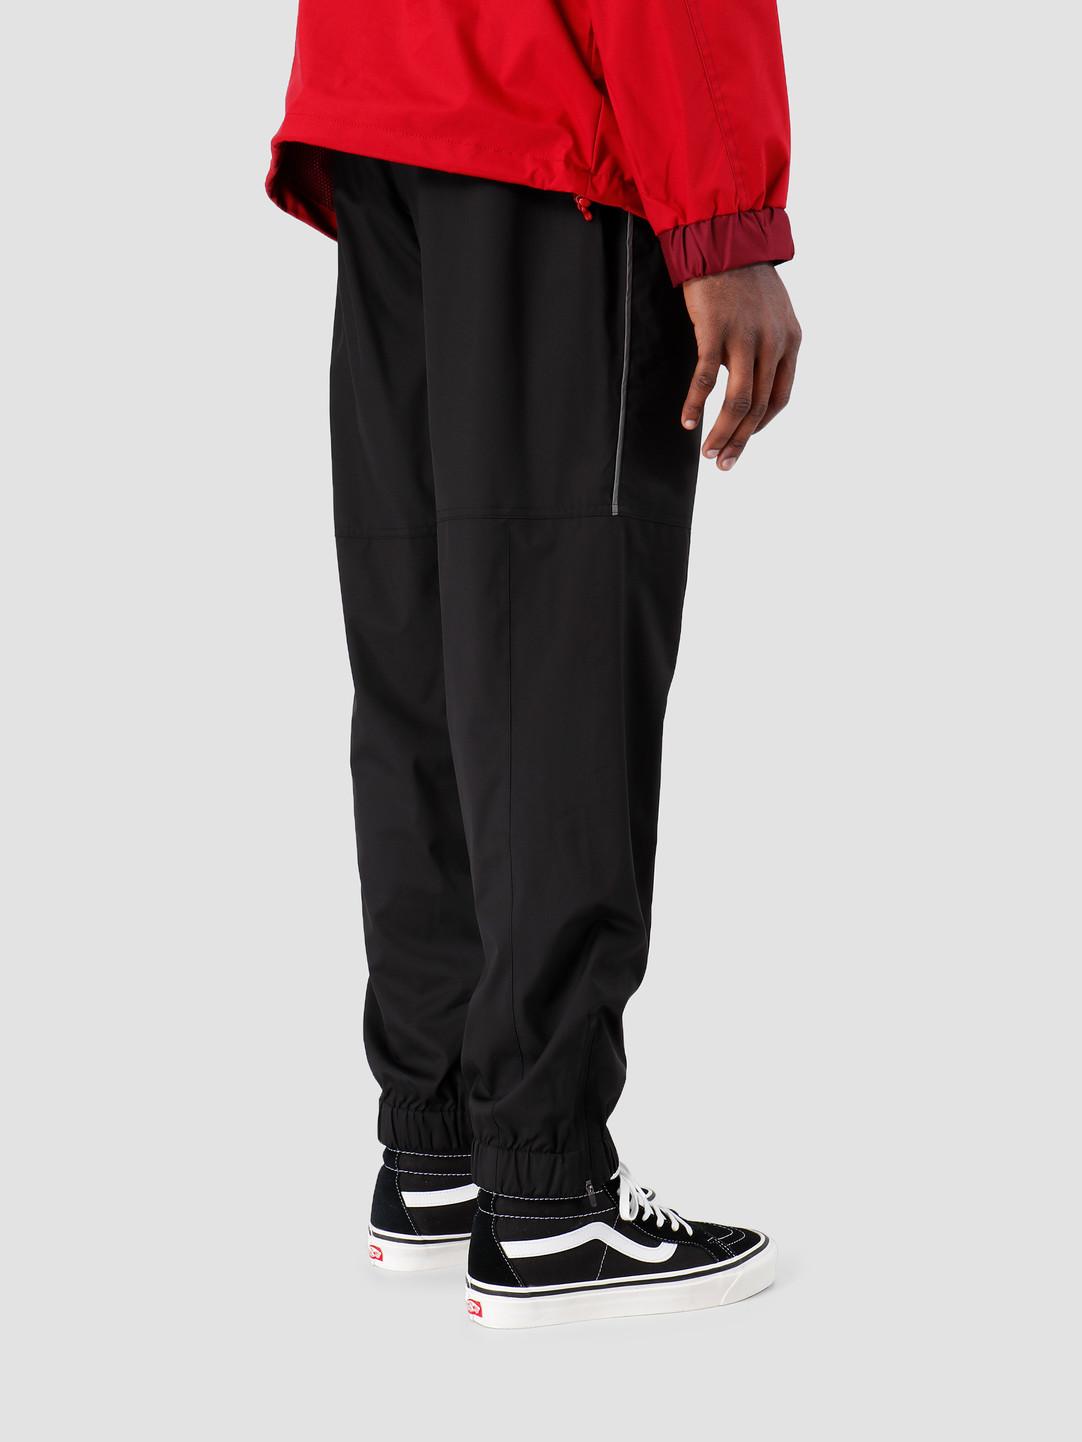 Stussy Stussy Alpine Pant Pant Black 0001